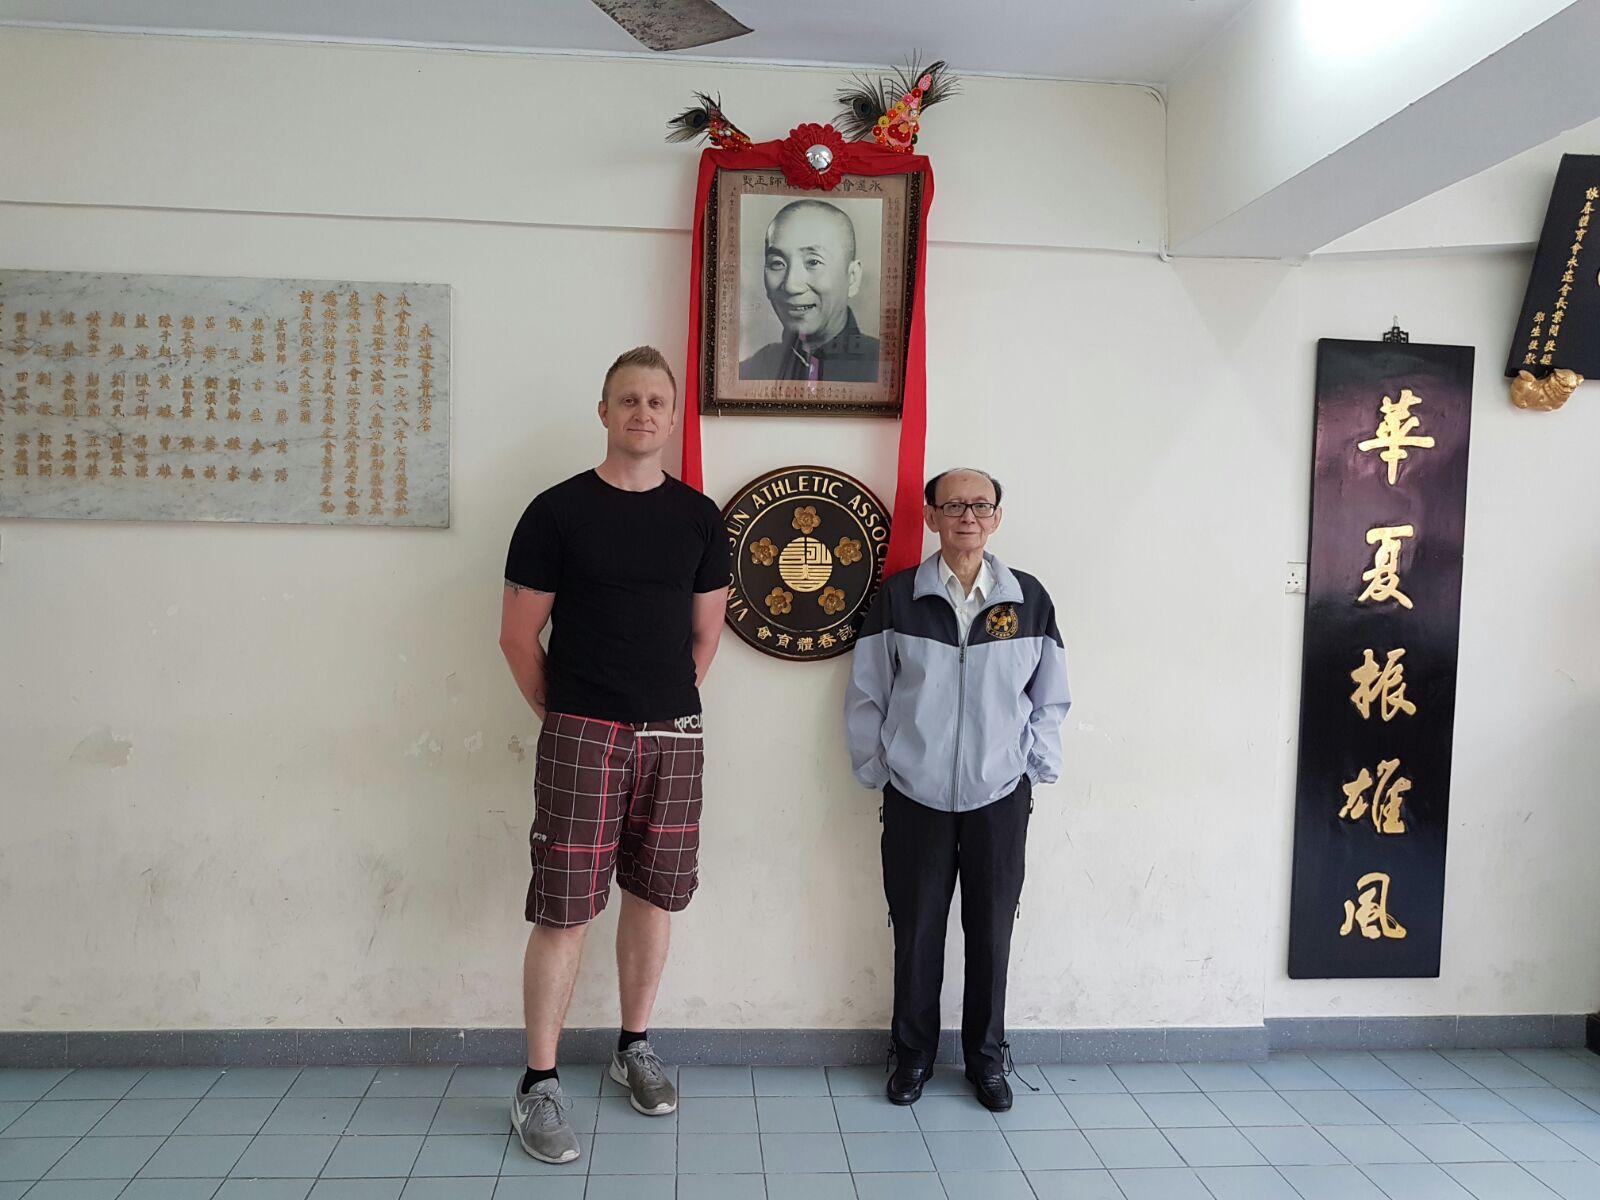 Robert Ley with his Sifu, Gm Roland Tong in the Ving Tsun Athletic Association in Hong Kong